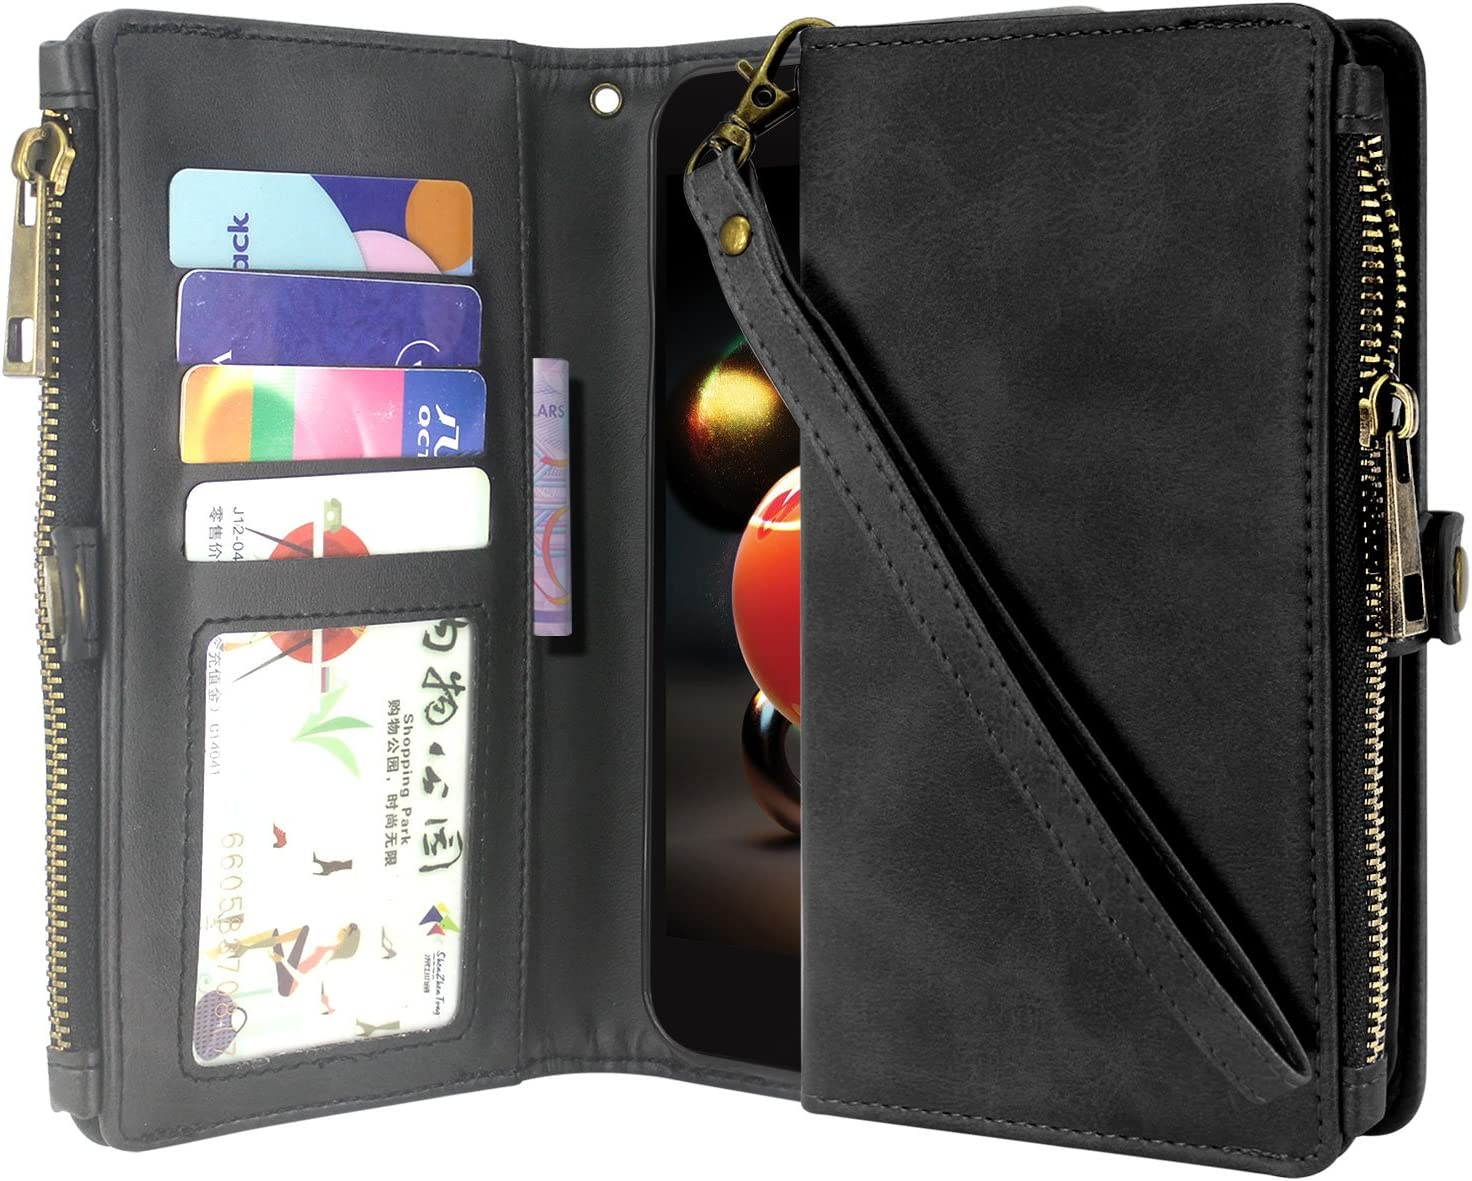 LG Aristo 2/Aristo 3 /Rebel 4 /Phoenix 4 /Rebel 3/Tribute Dynasty/Zone 4 Case/Fortune 2 Case, Premium Leather Flip Zipper Wallet Case Stand Feature with Card Holder and Wrist Strap - Zipper Black